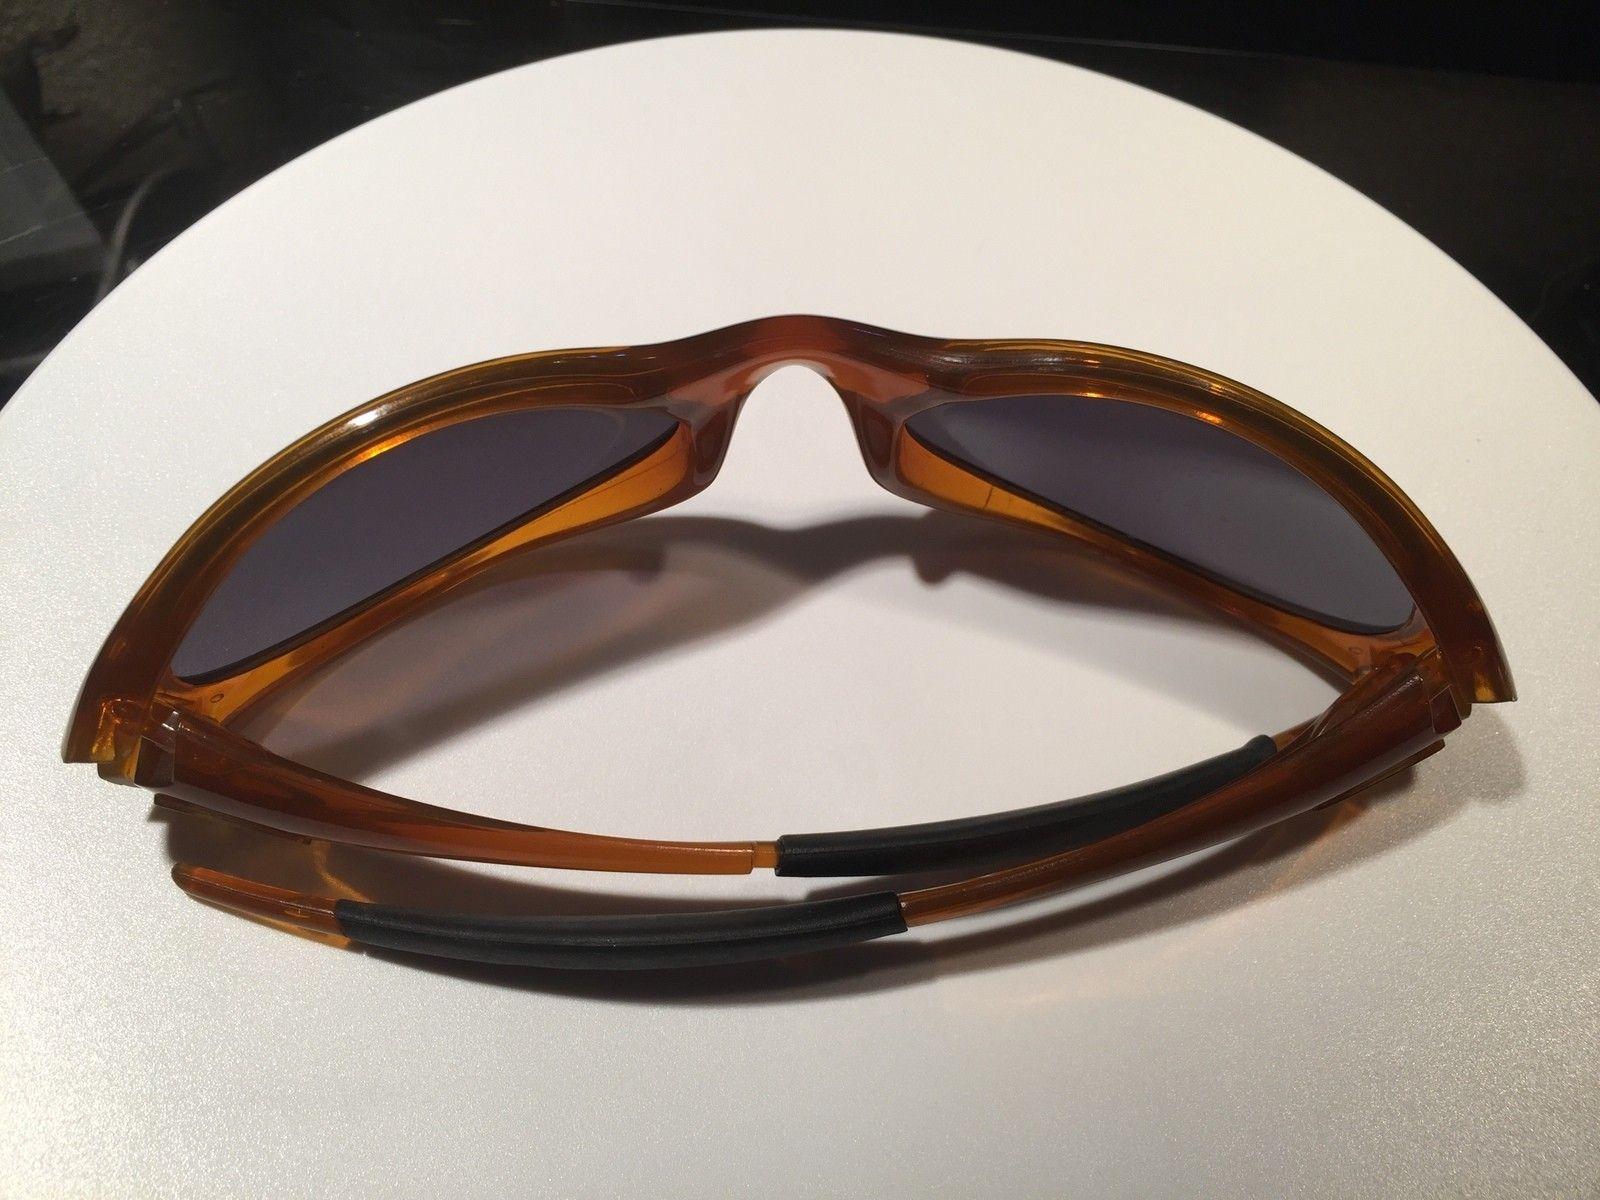 BNOB Eye Jacket 10w40 w/ Black Iridium #SOLD - image.jpeg